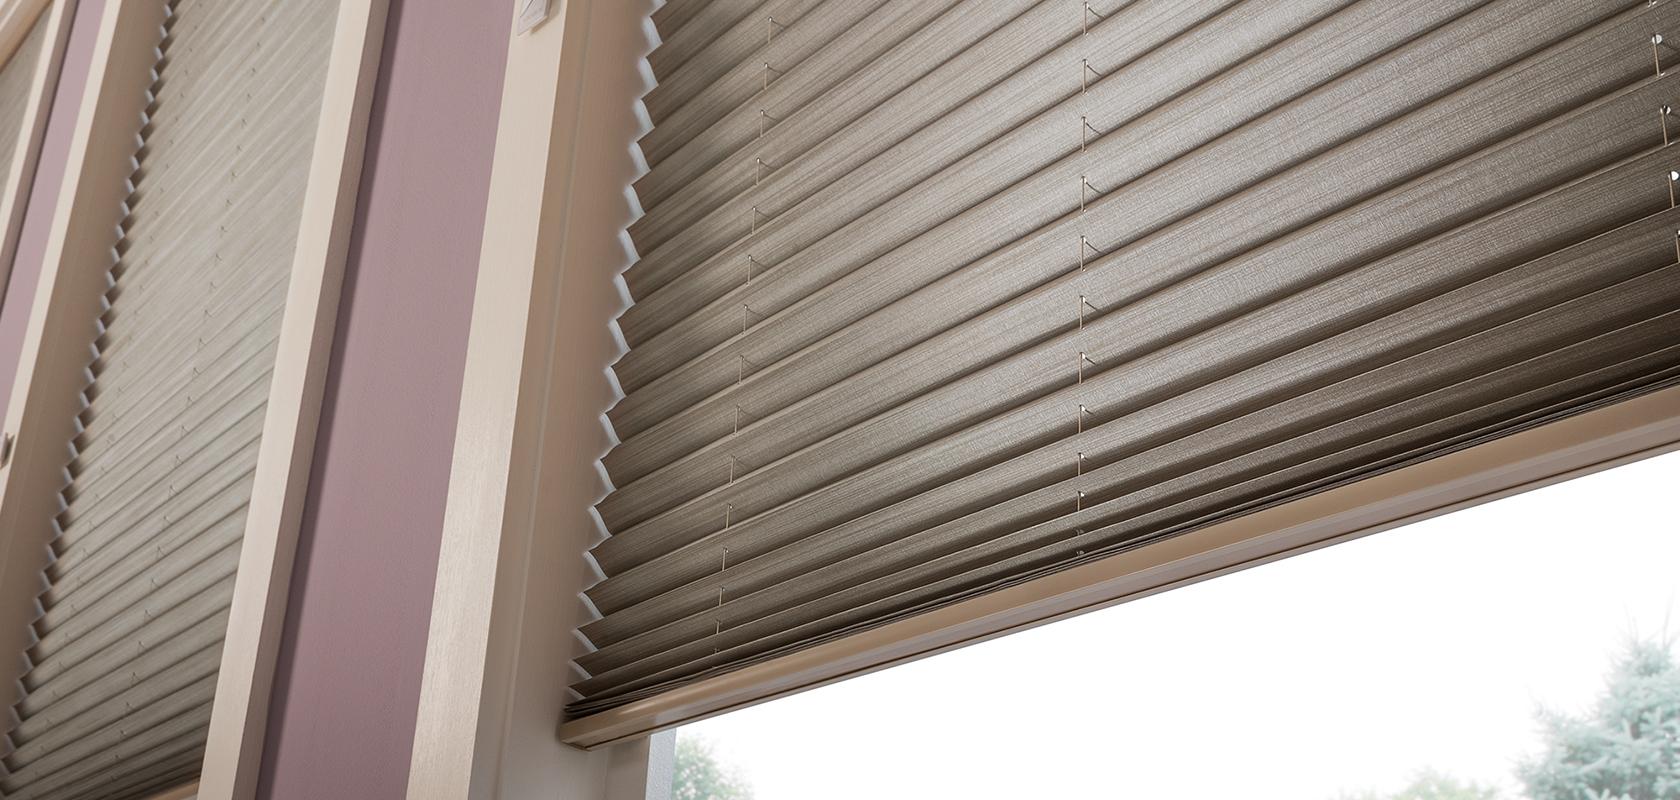 thingiverse holder model window cord wrap blinds models blind